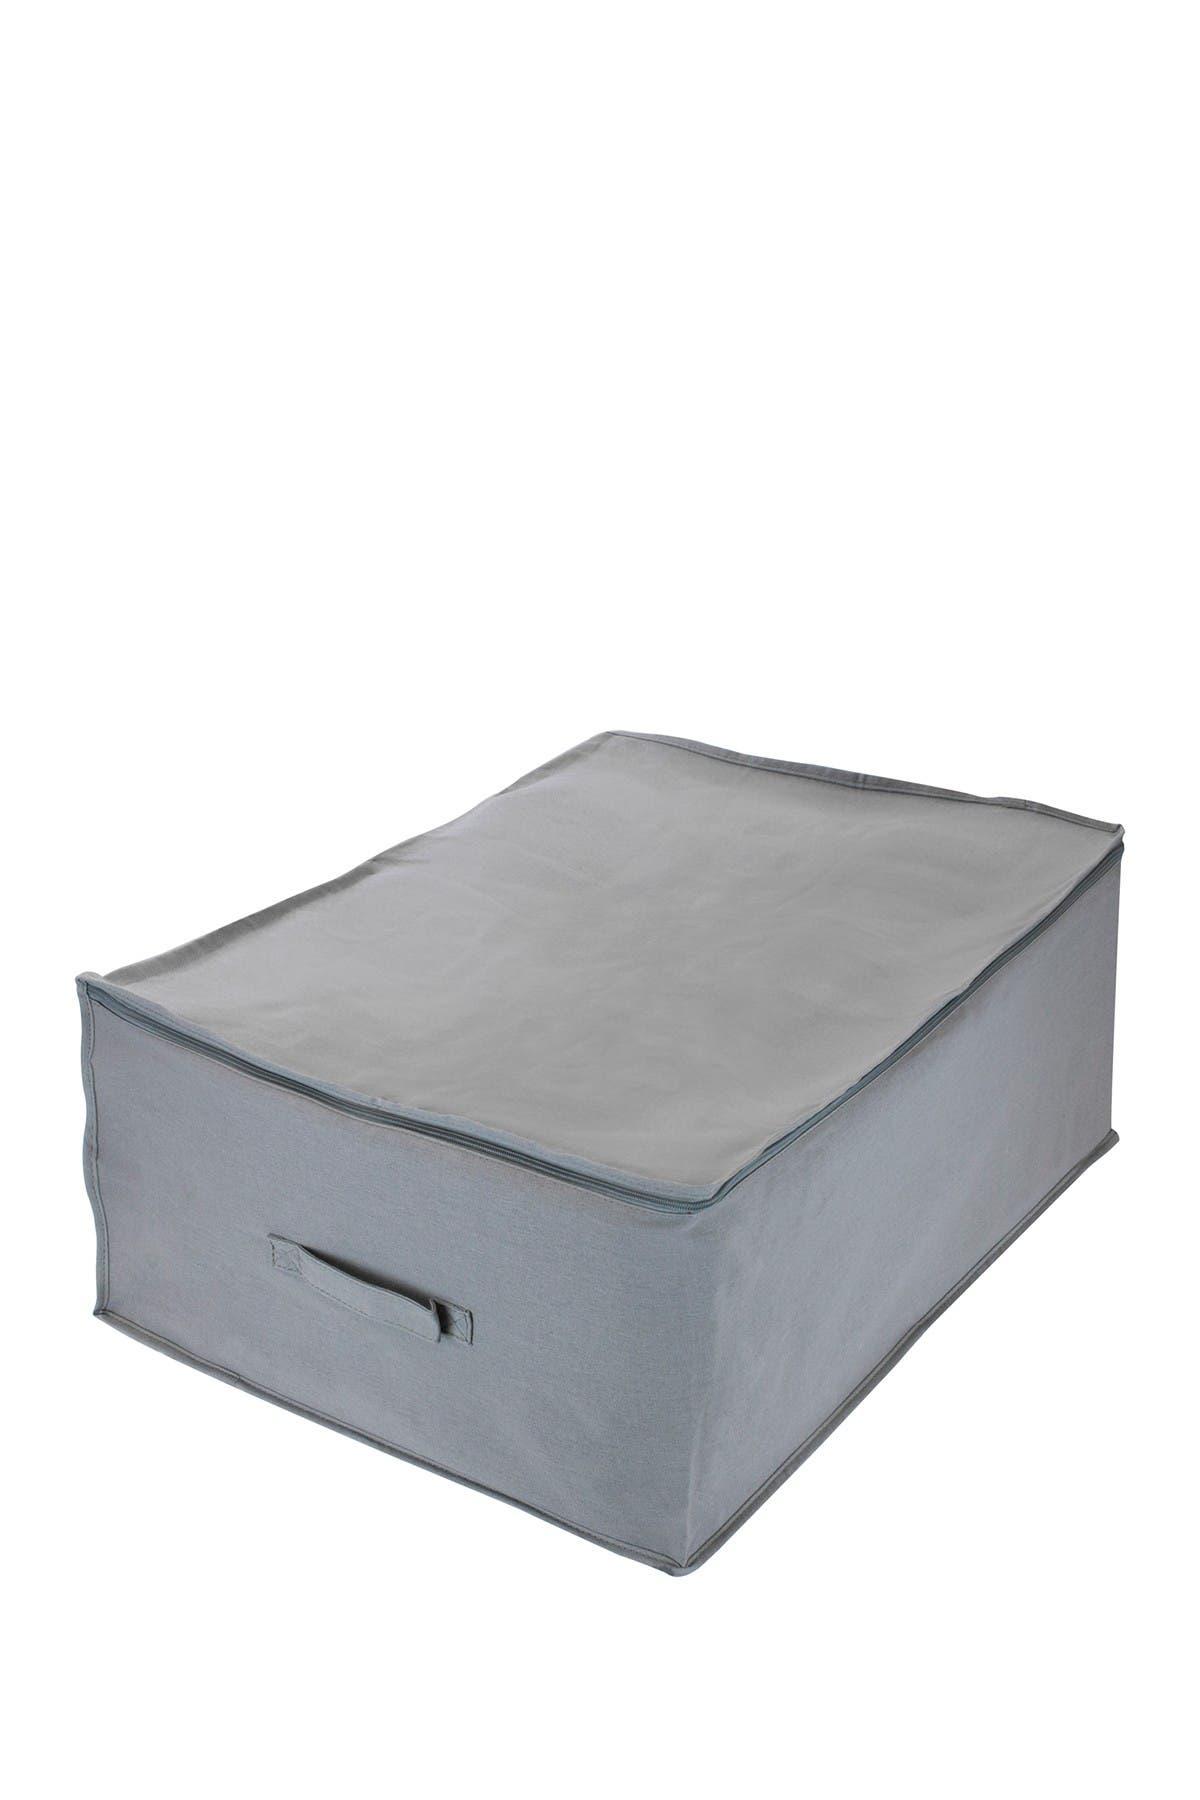 Image of Sorbus Jumbo Foldable Storage Organizer Bag - Grey